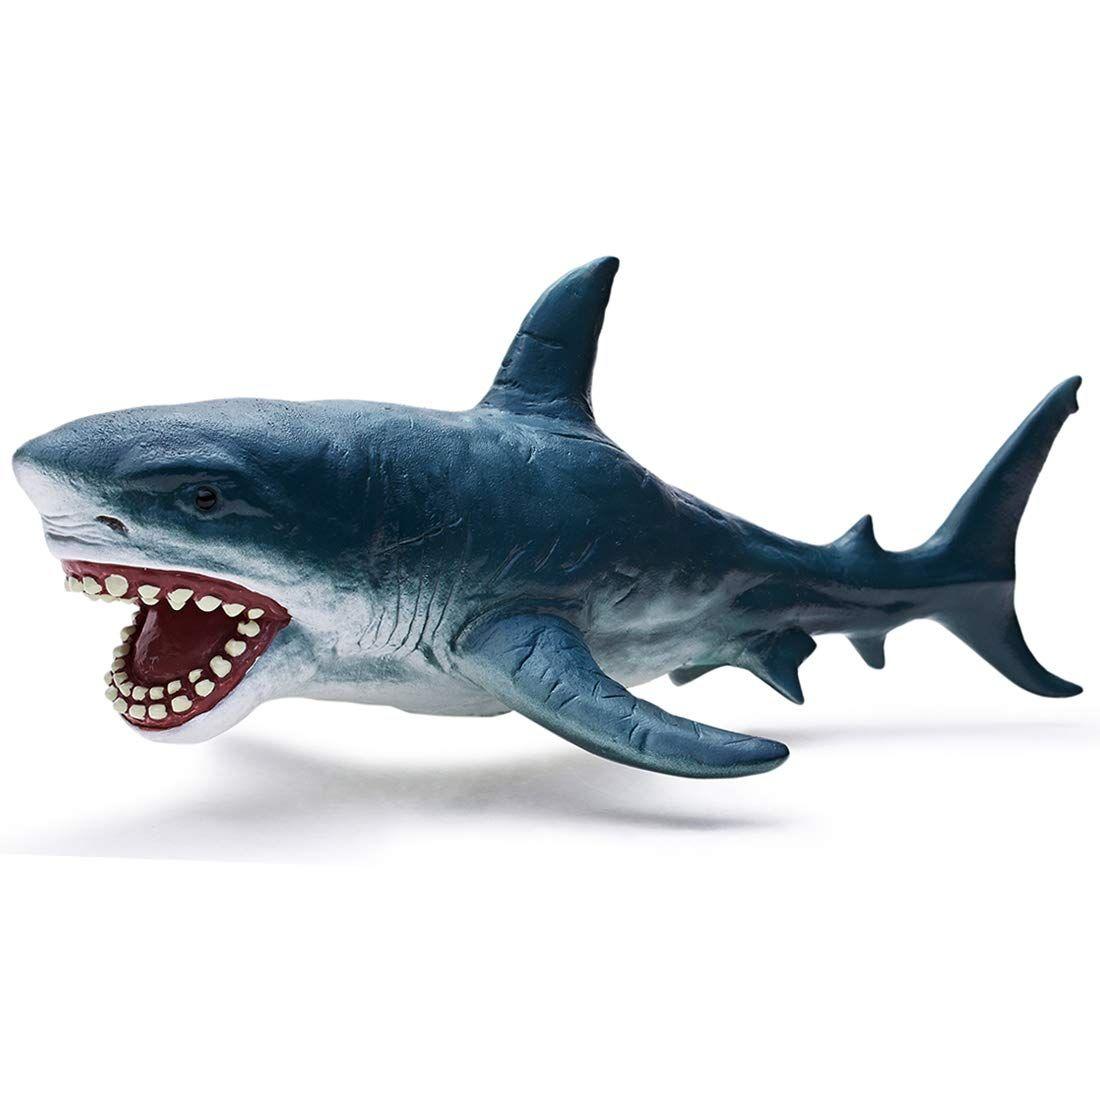 Recur Toys 10 2 Great White Shark Figure Toys Megladon Shark